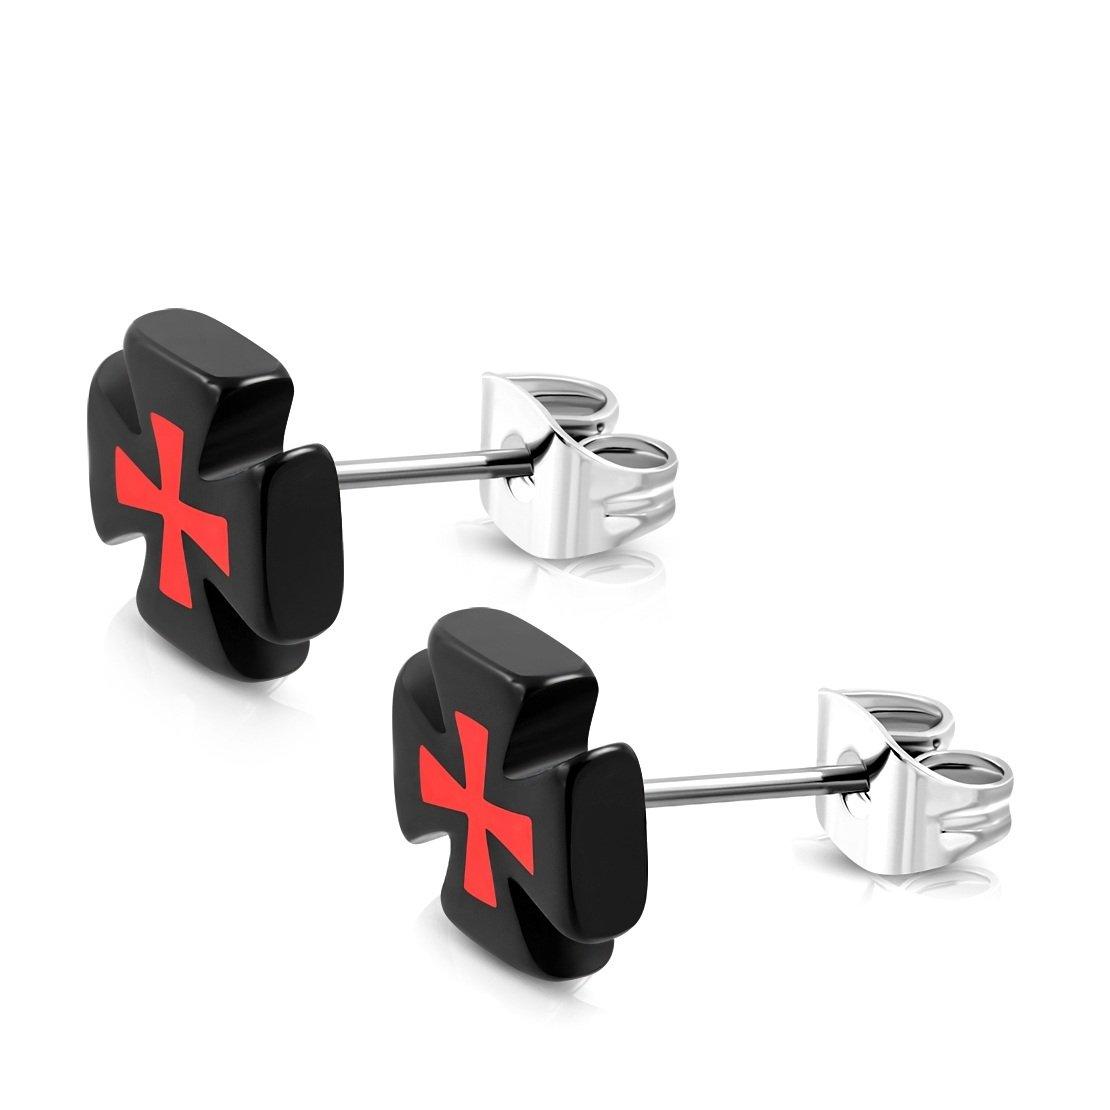 Stainless Steel Stud with Black Acrylic 3 Color Pattee Cross Earrings pair